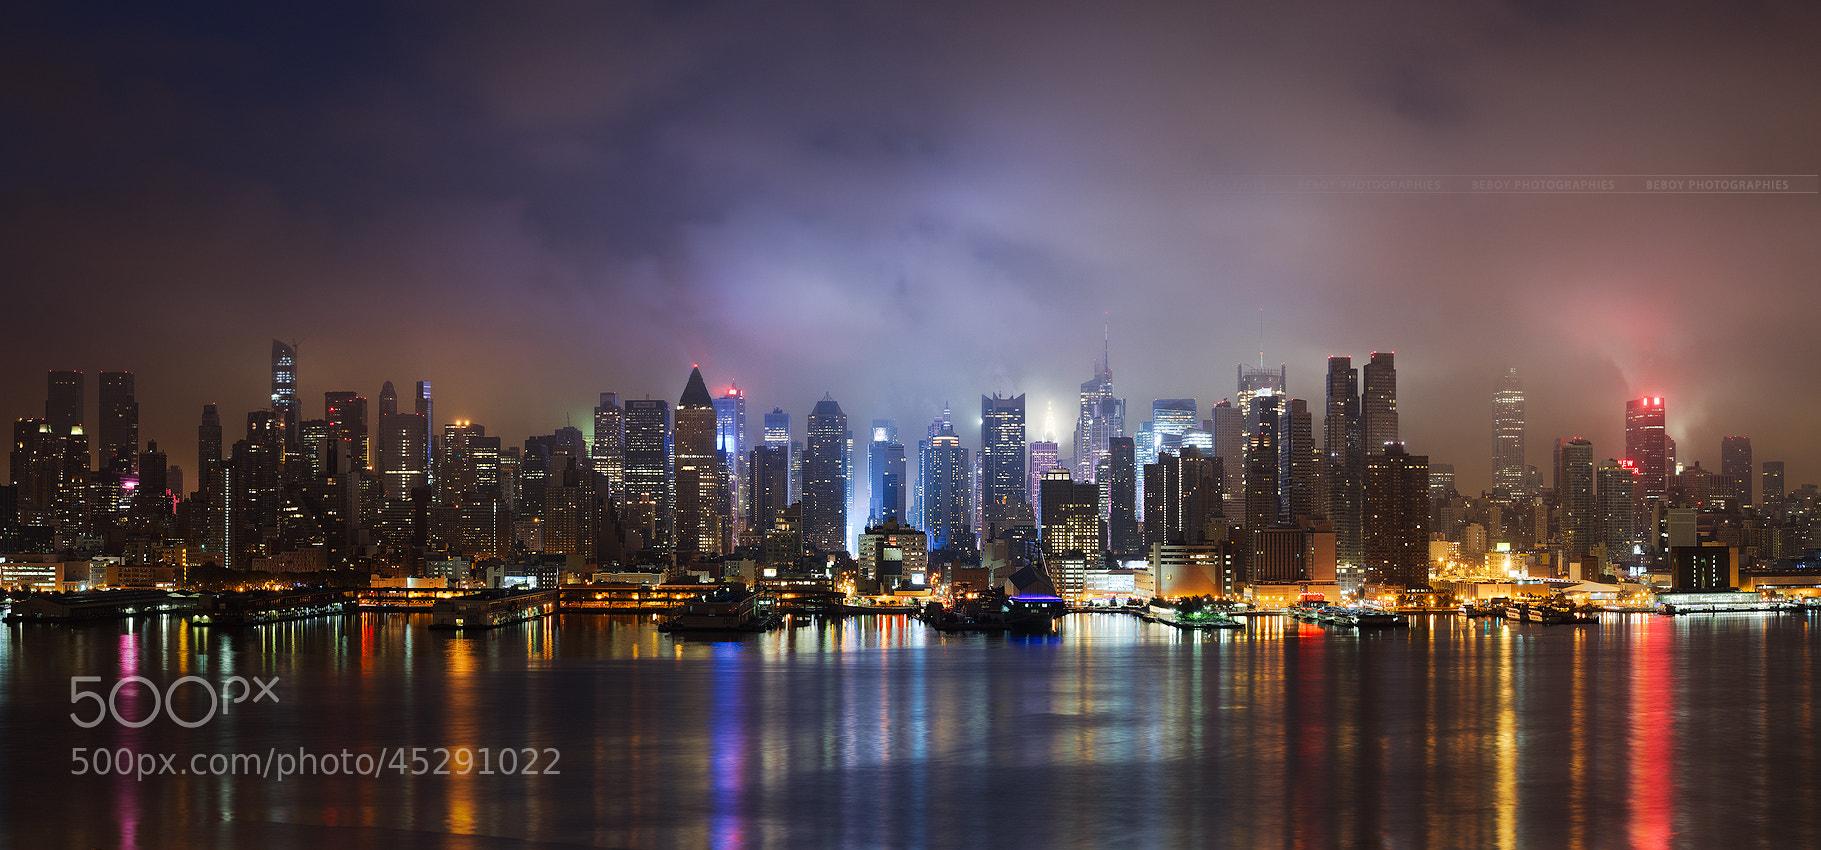 Photograph Light Symphony, New-York City by Beboy Photographies on 500px